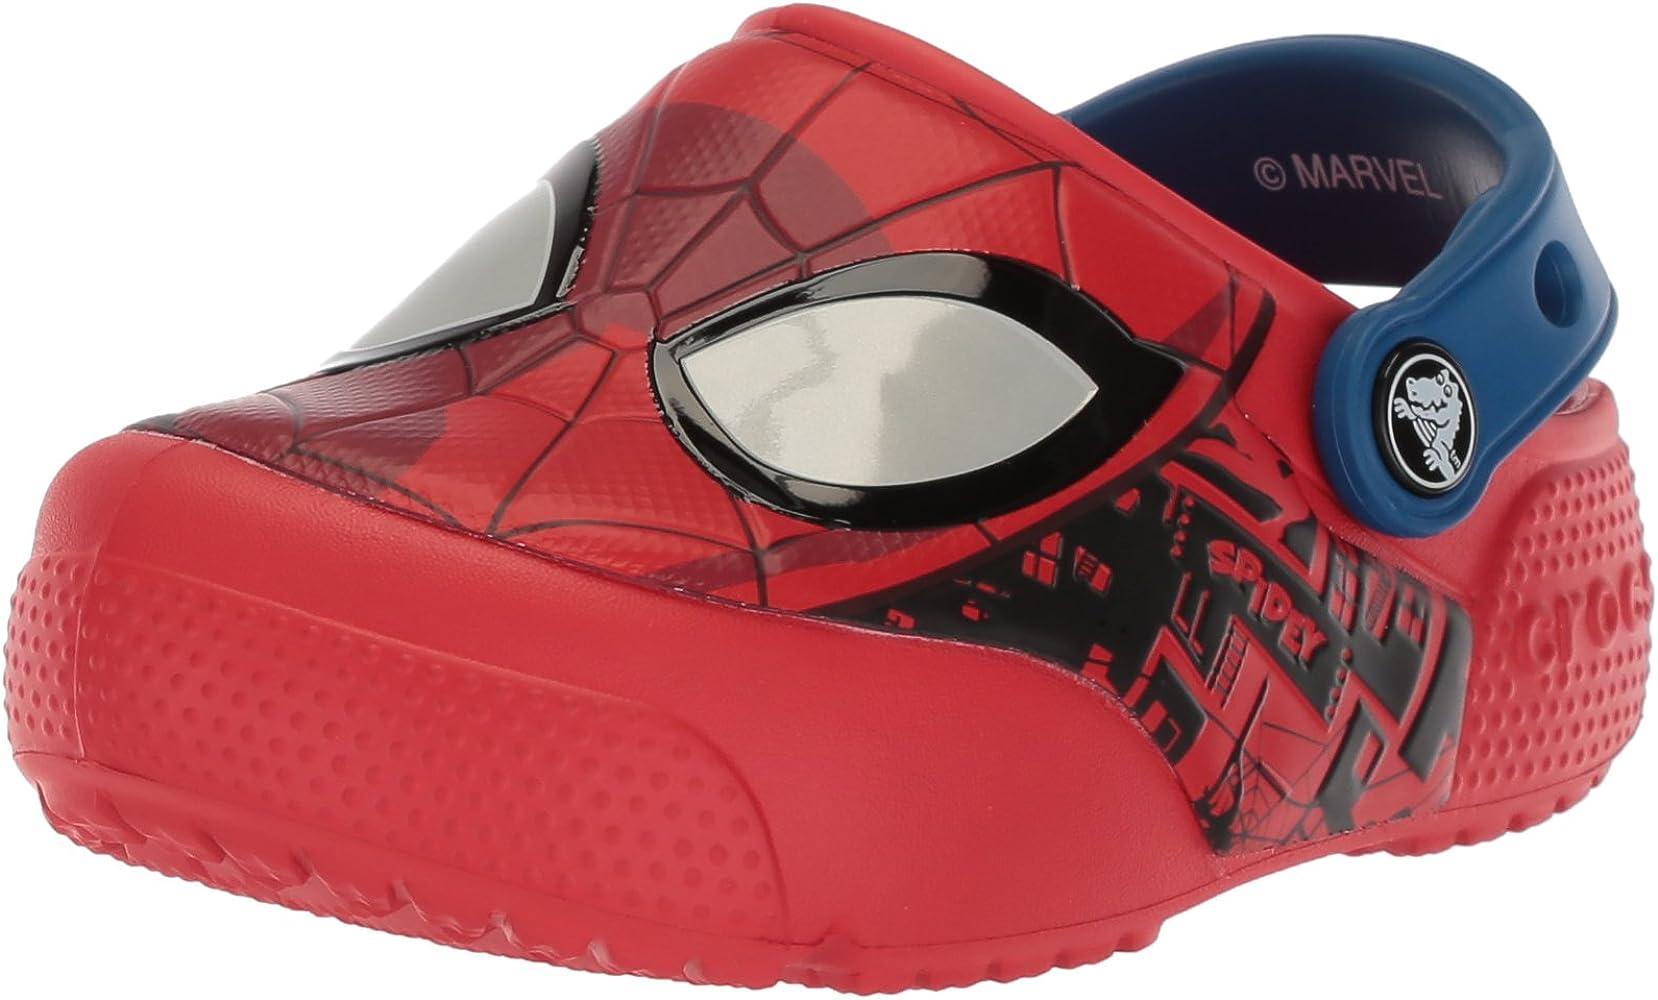 Crocs FunLab SpiderMan Lights Clog Kids